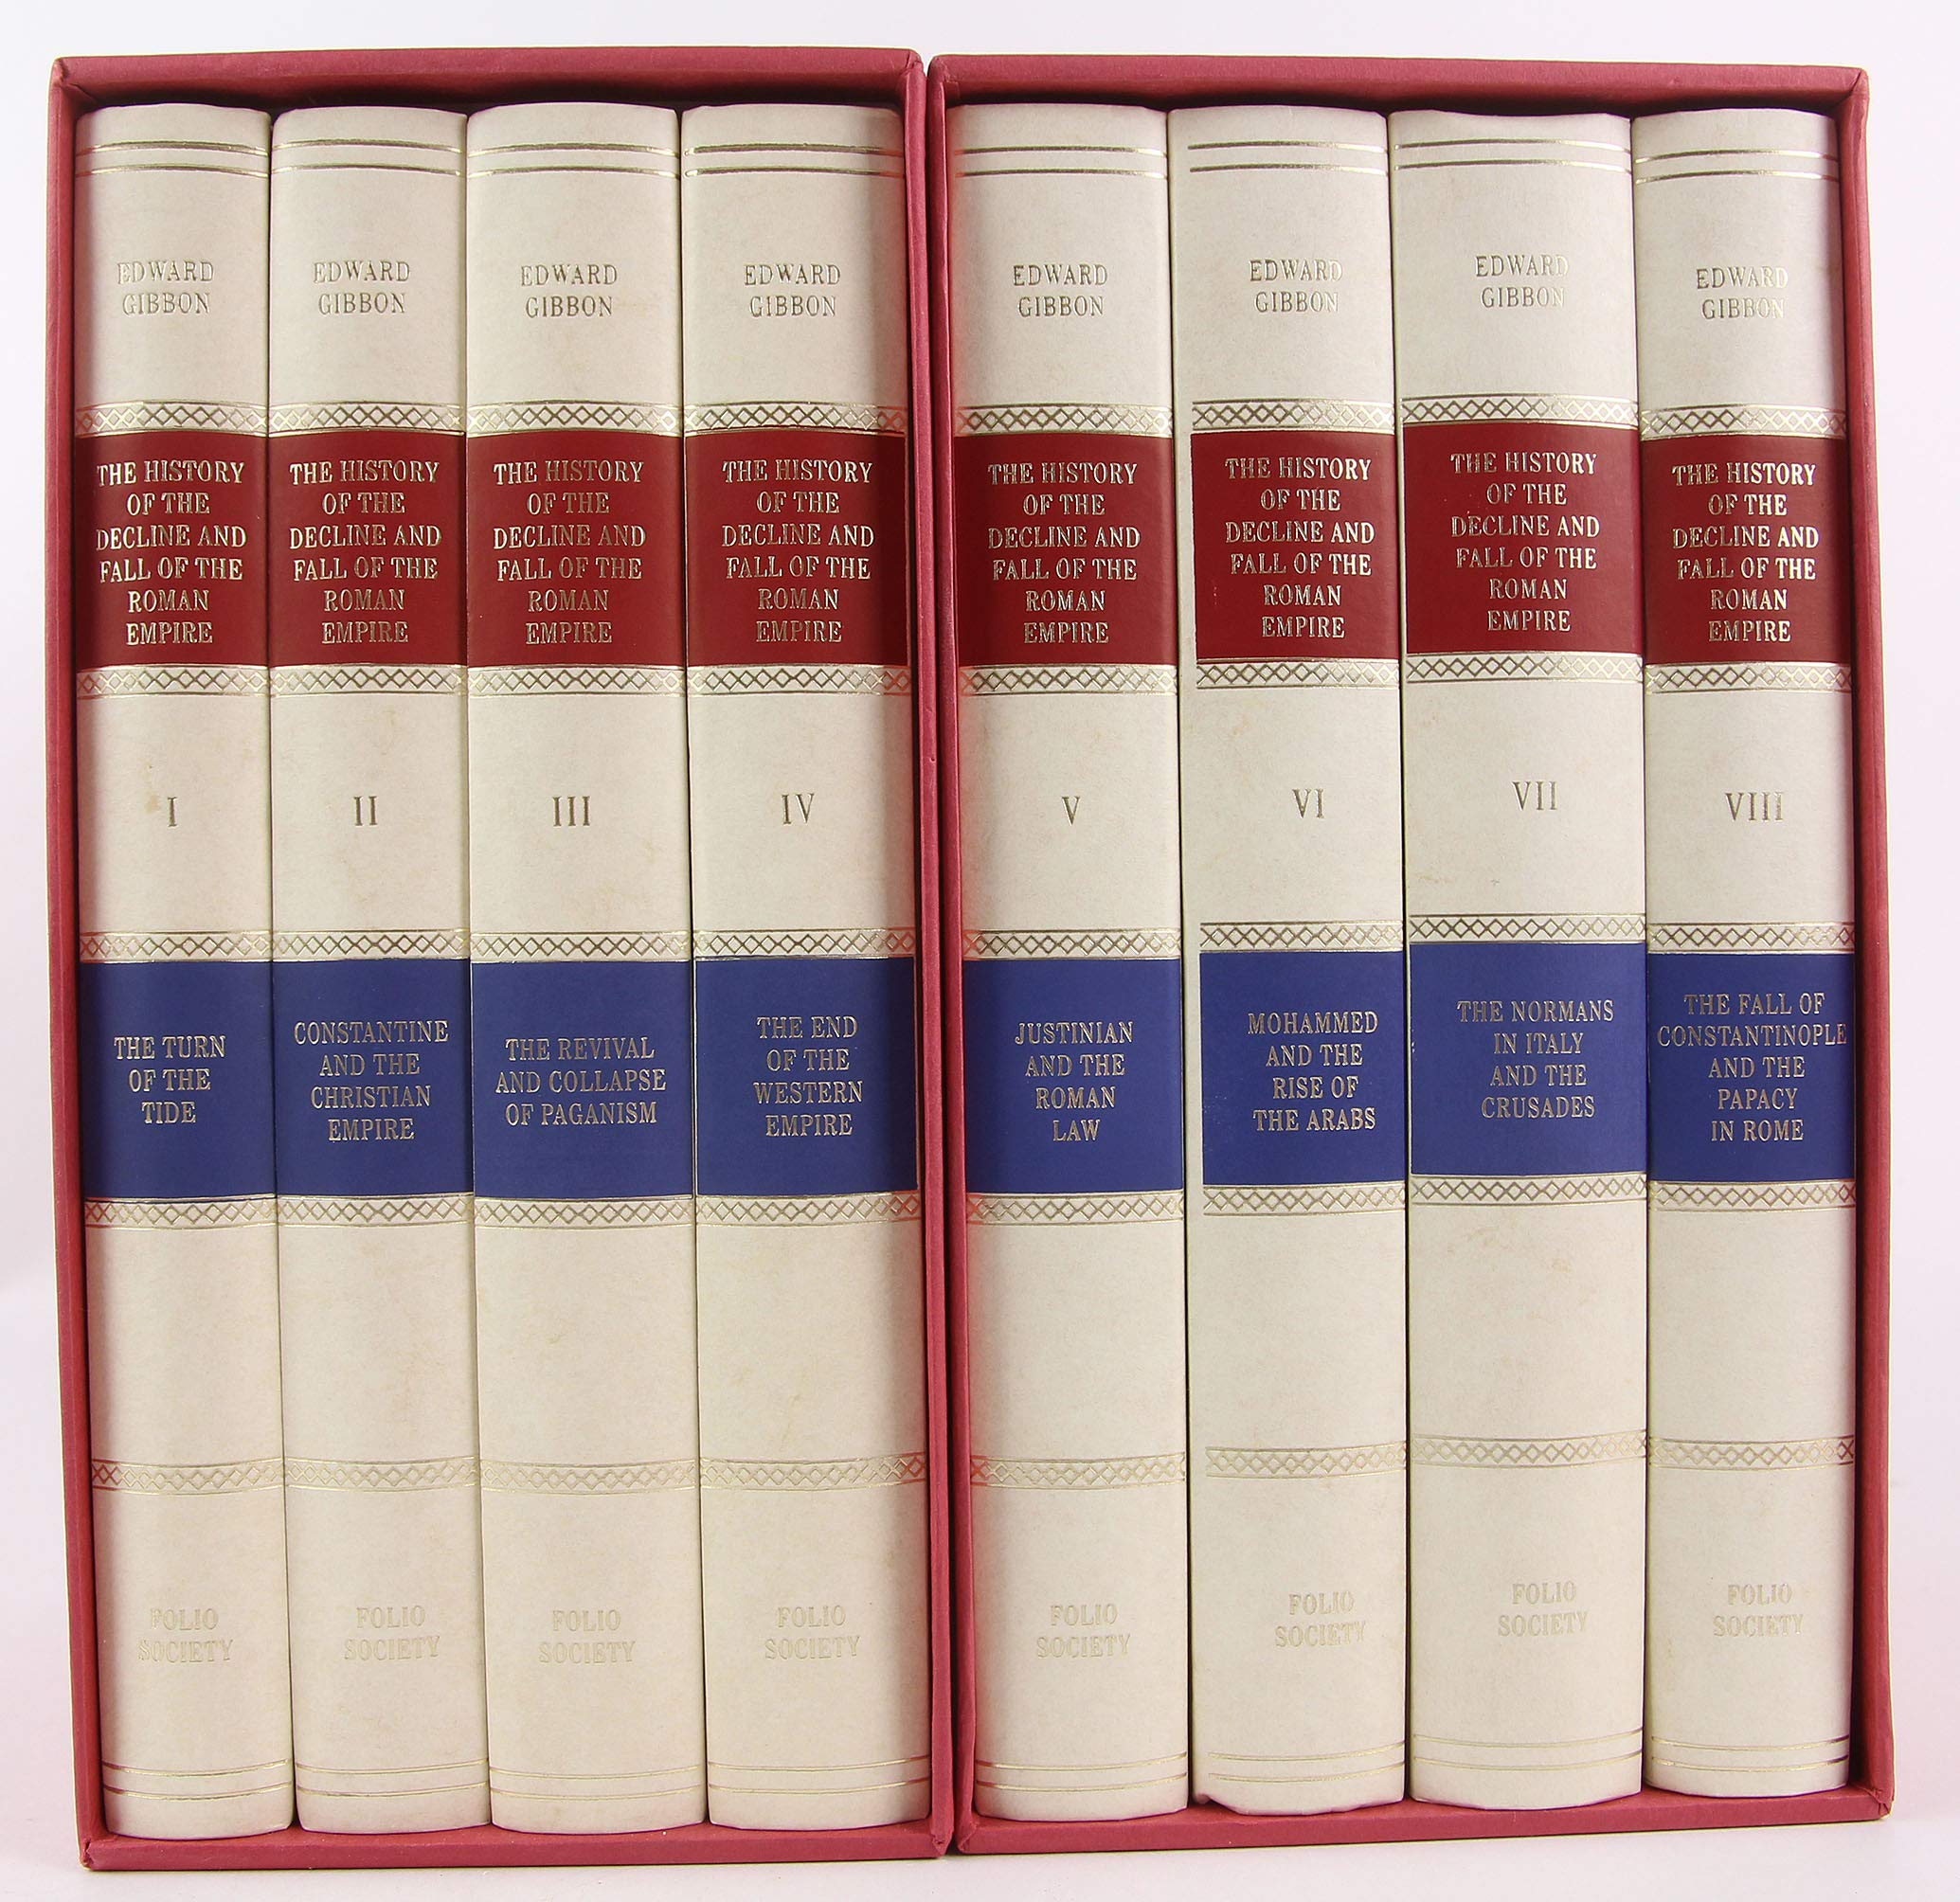 The History of the Decline and Fall of the Roman Empire (8 Volumes Set):  Edward Gibbon, Betty Radice: Amazon.com: Books